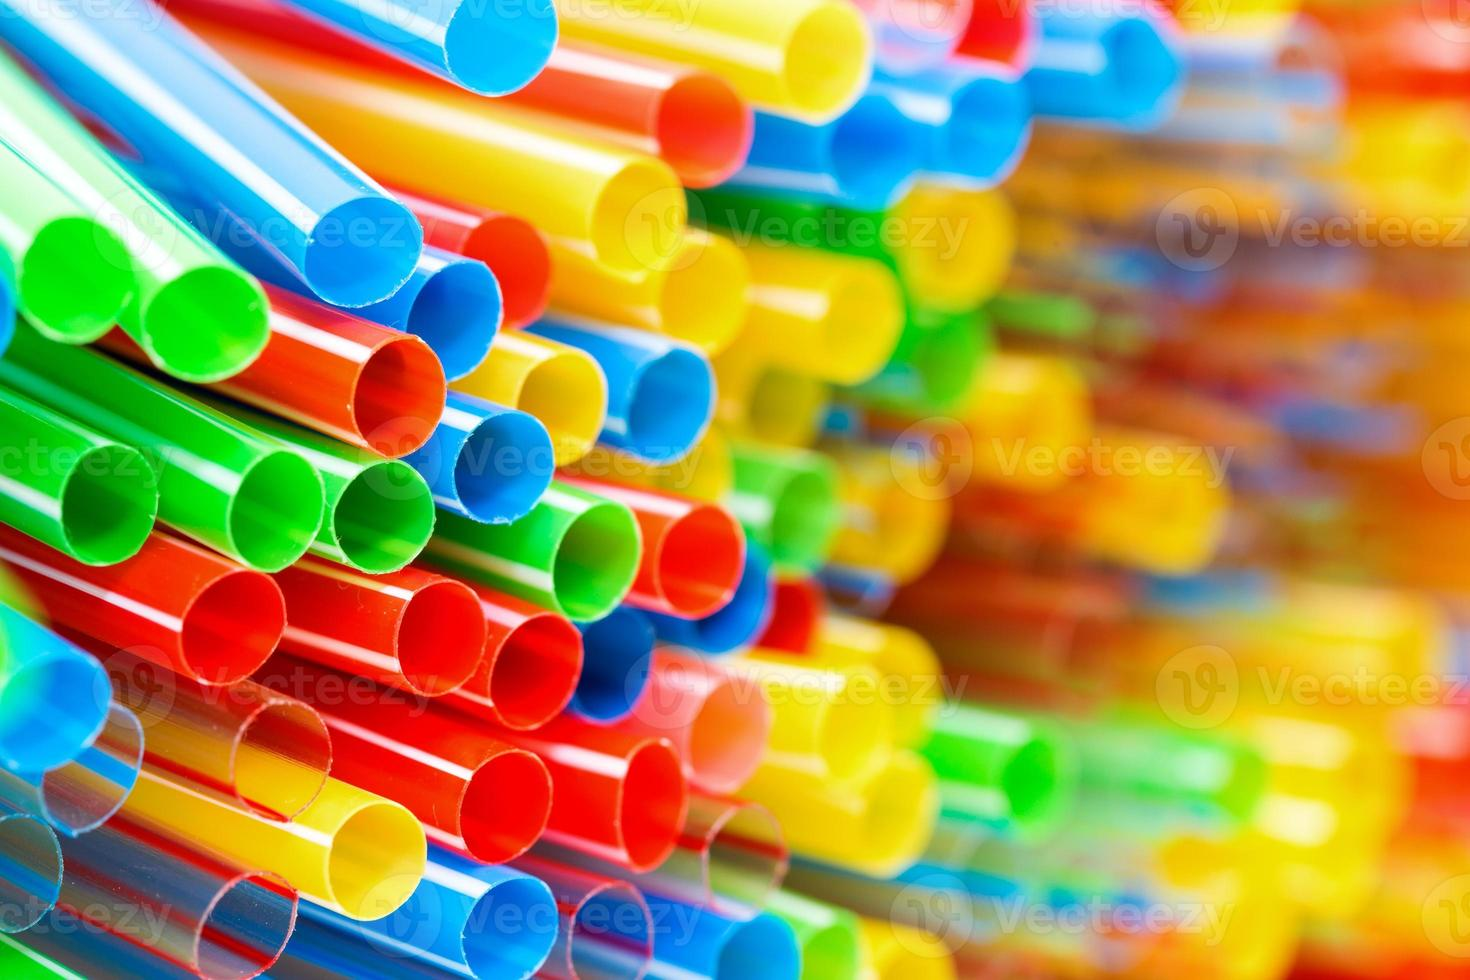 farbige Plastik Trinkhalme Nahaufnahme foto